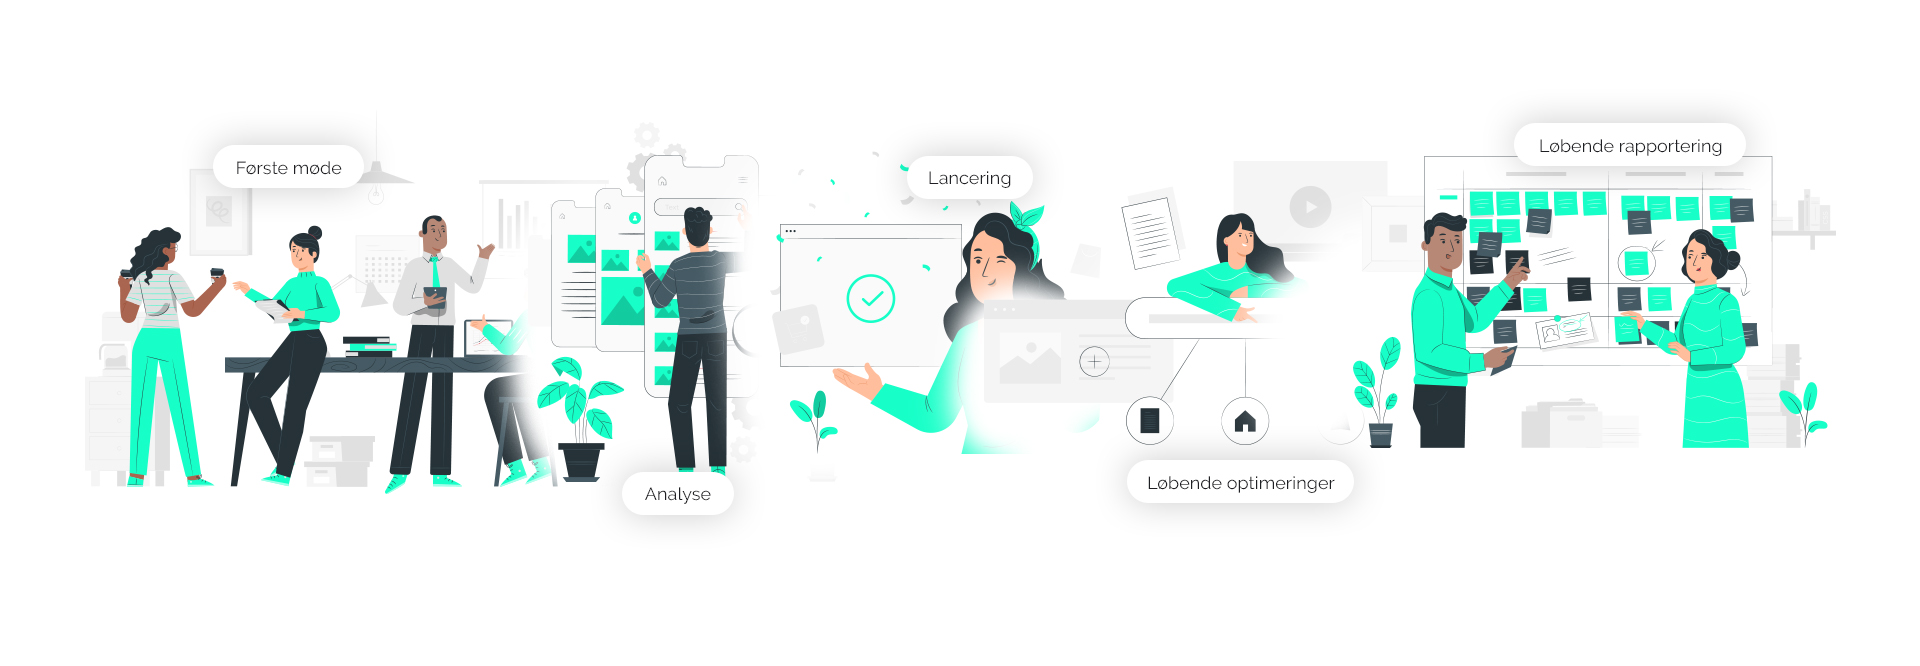 Online markedsførings processen